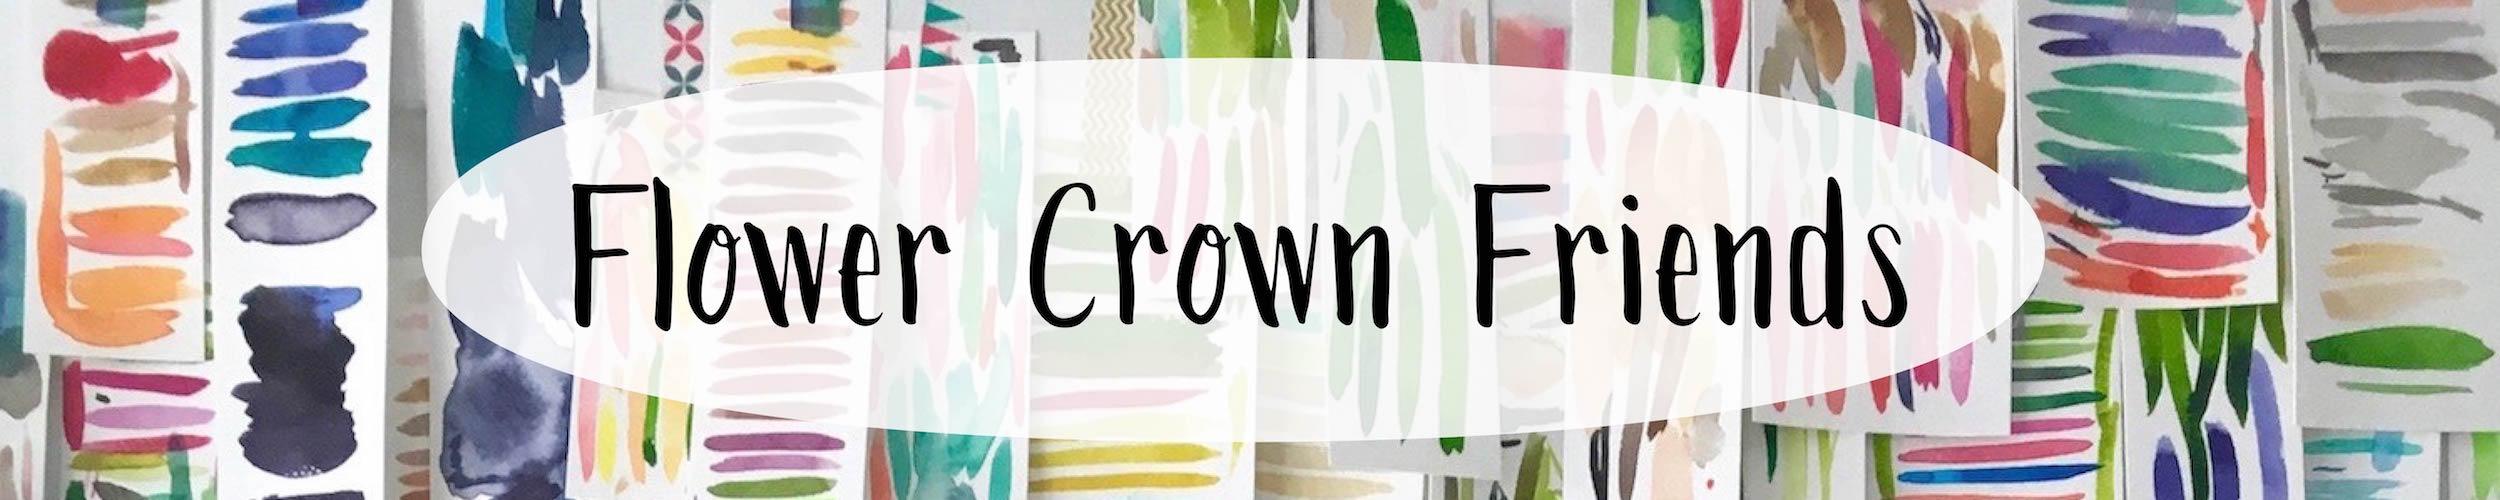 Flower Crown Friends - Watercolor Animals with Flower Crown Paintings